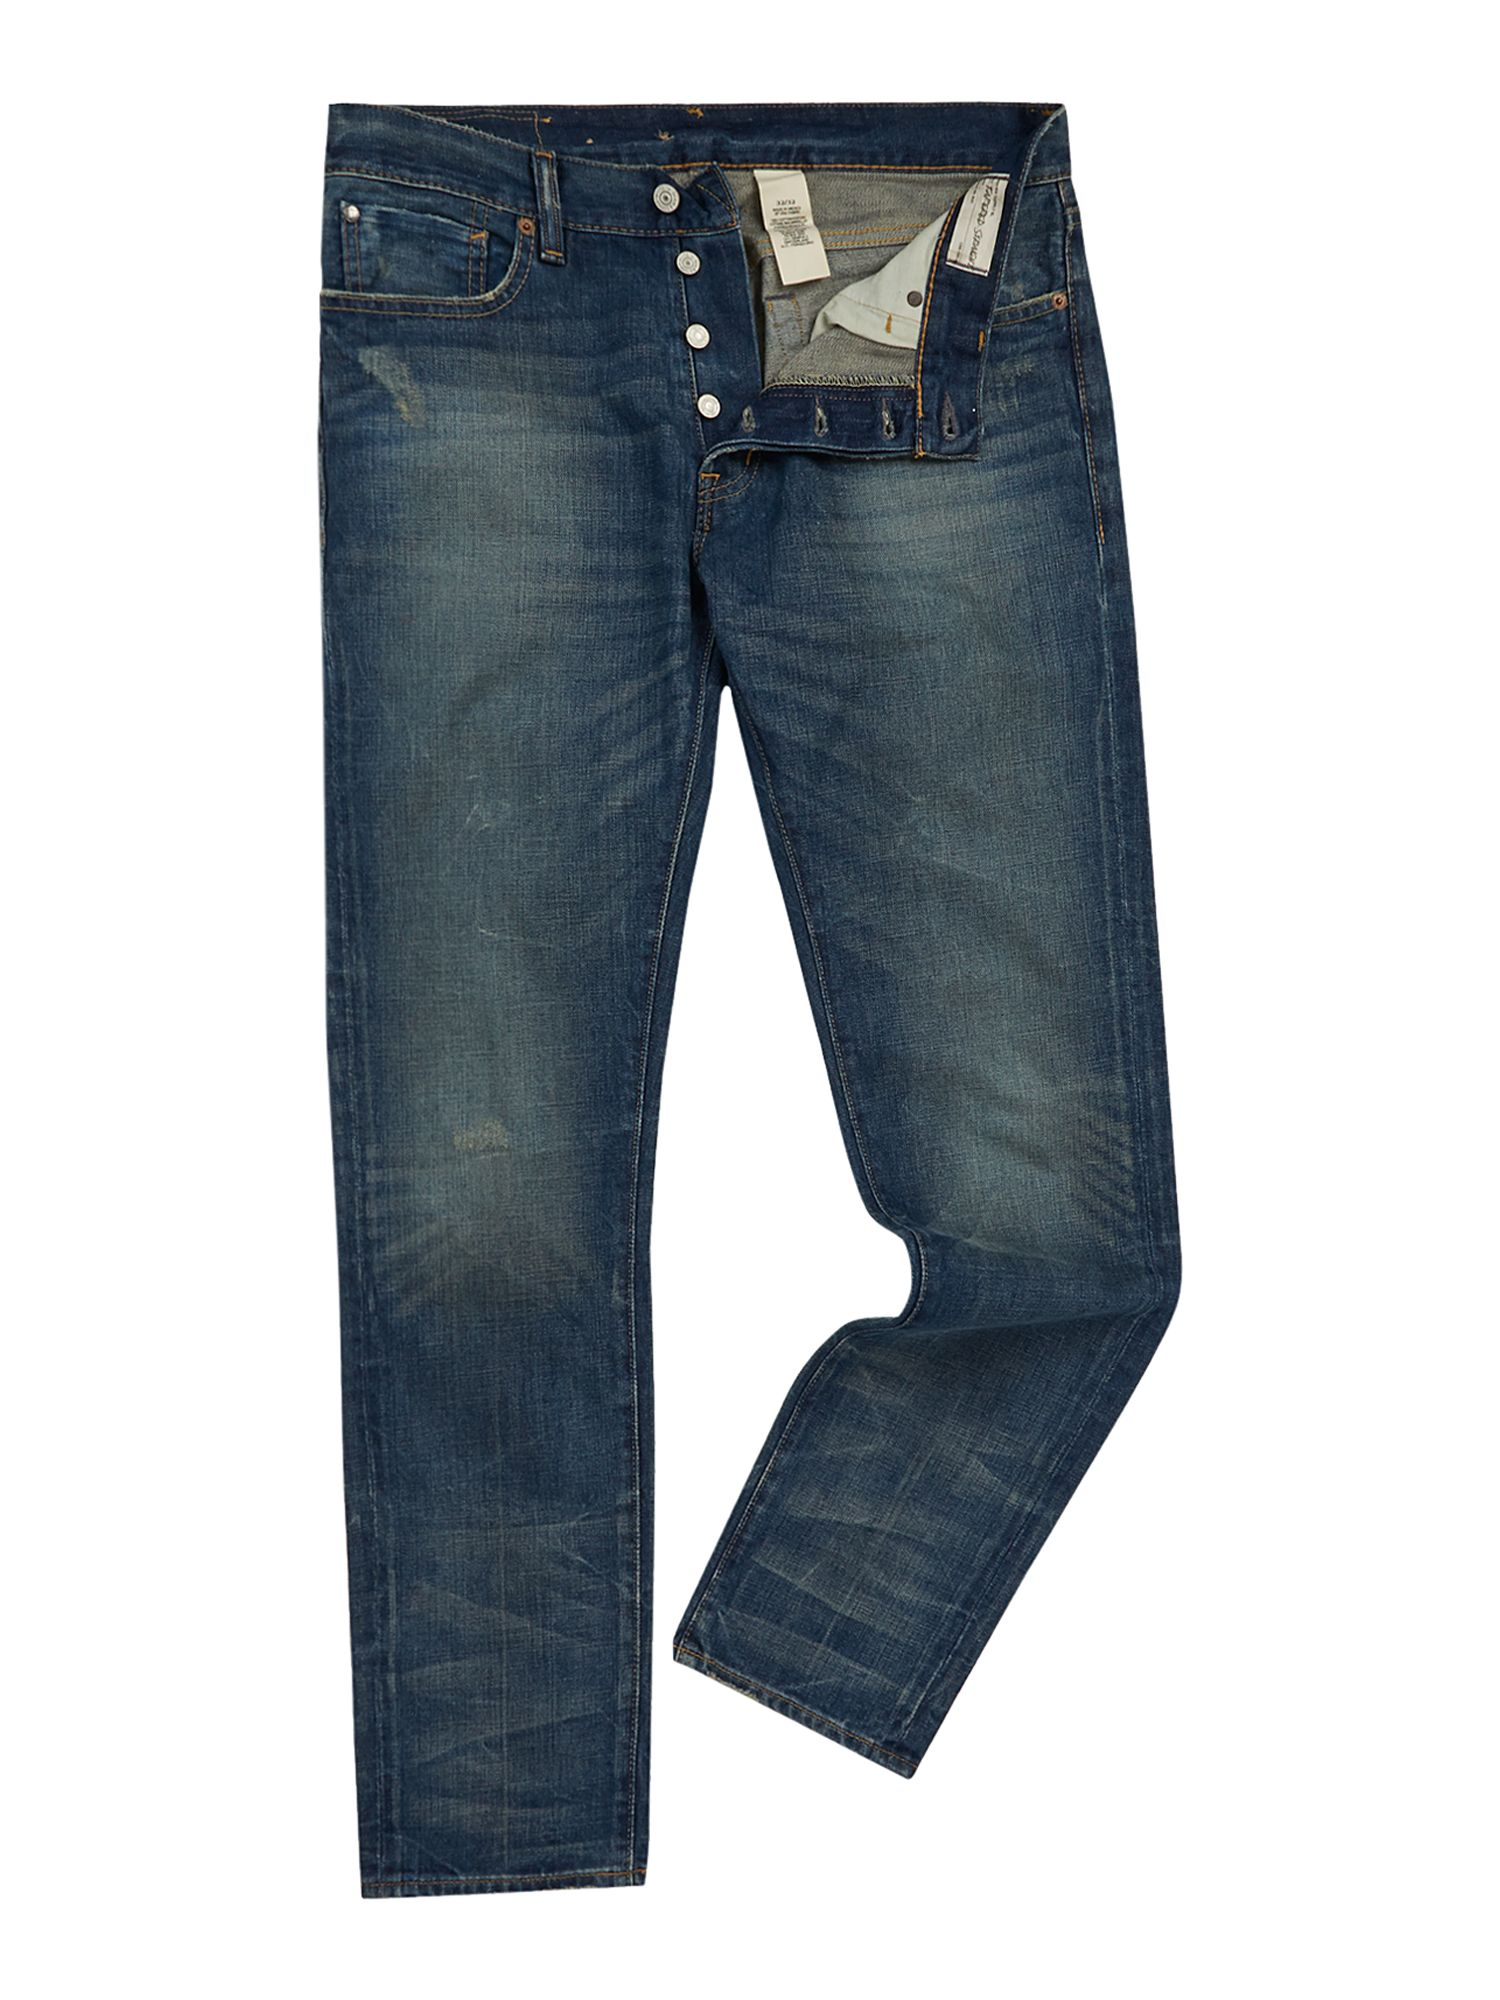 denim supply ralph lauren traverse jean in blue for men. Black Bedroom Furniture Sets. Home Design Ideas